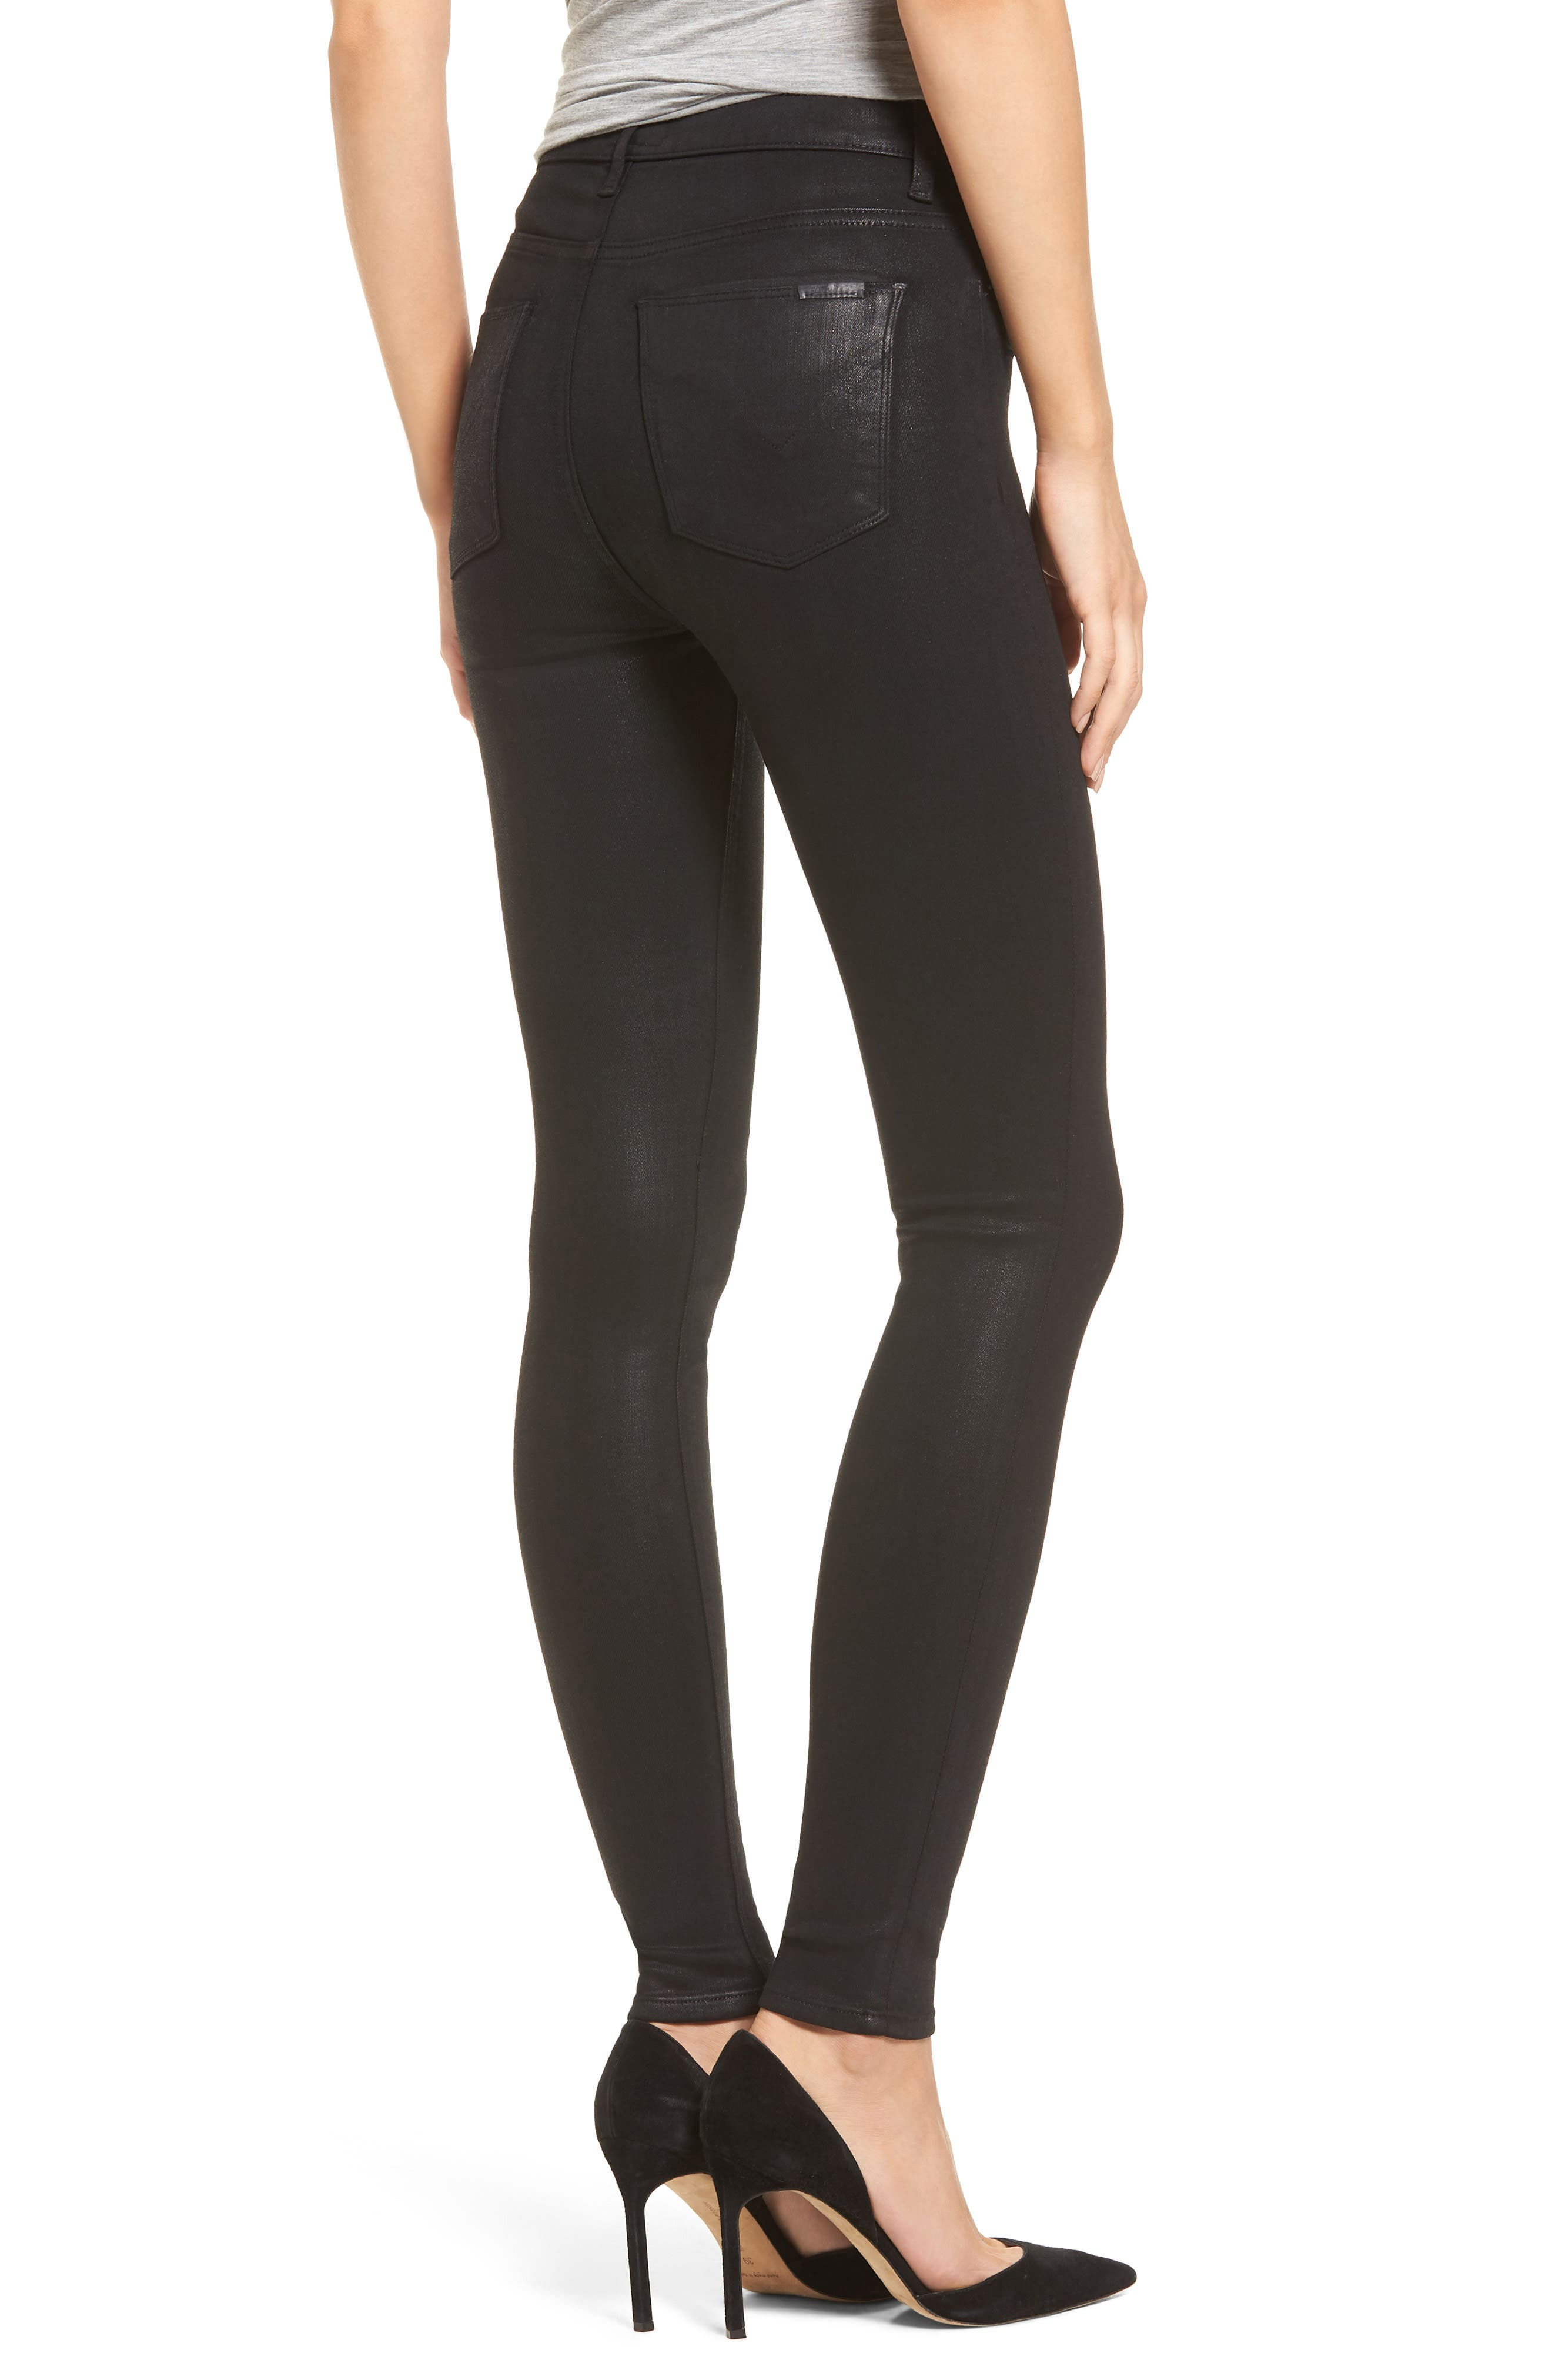 Barbara High Waist Skinny Jeans,                             Alternate thumbnail 2, color,                             Noir Coated